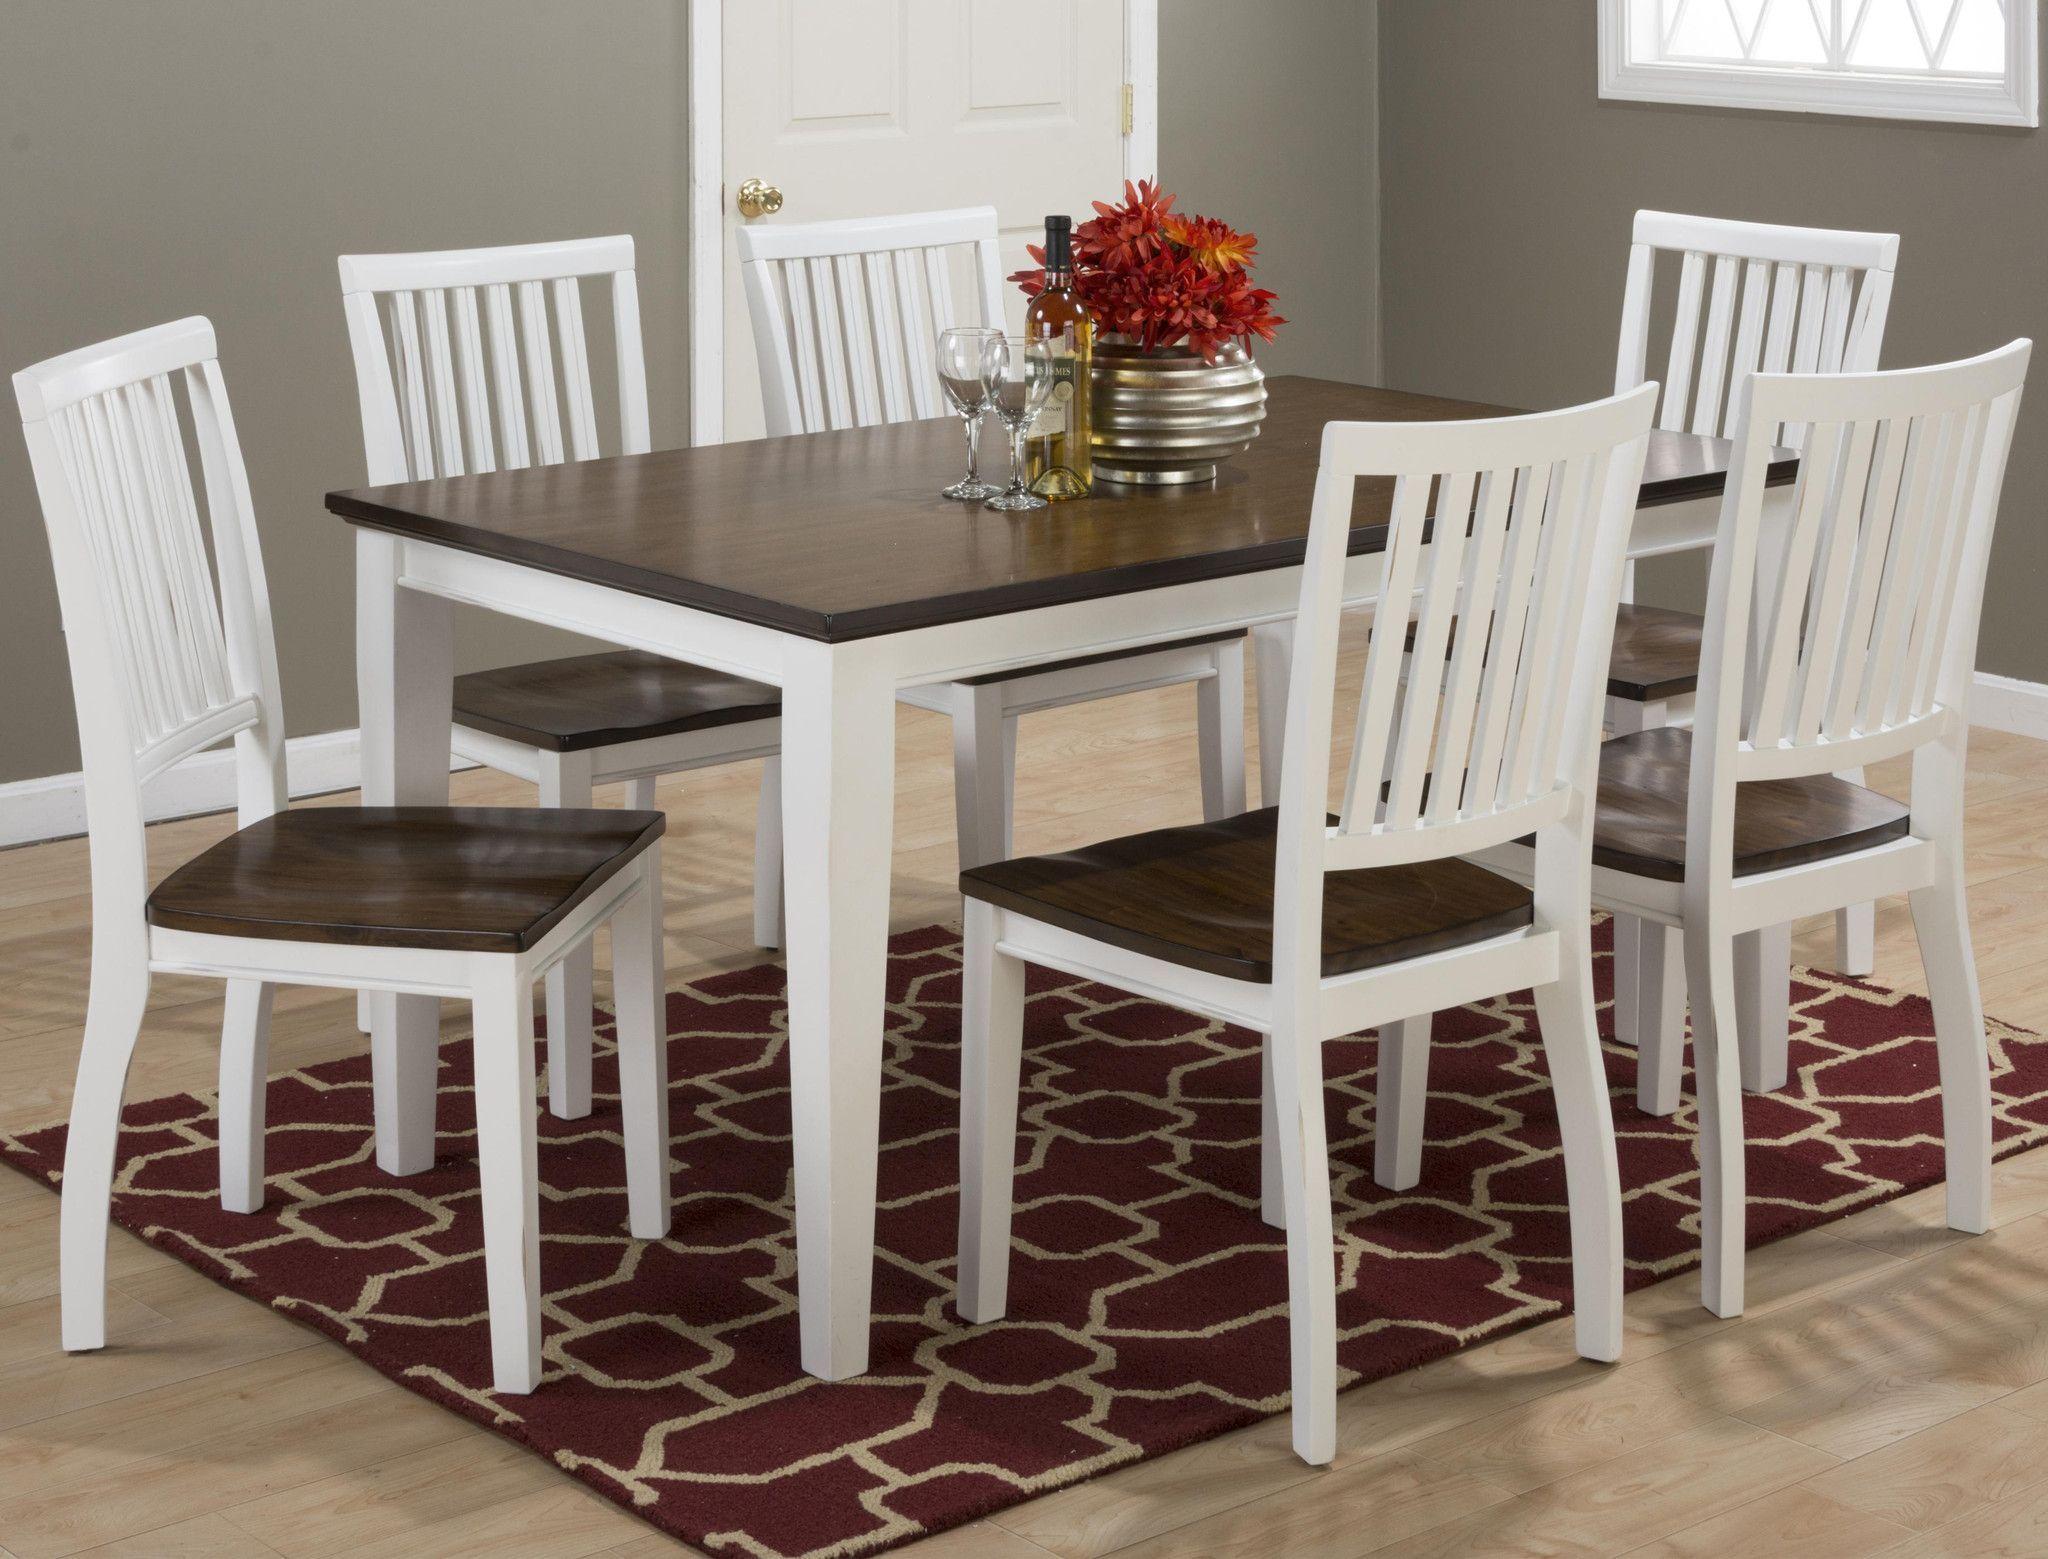 Braden Birch Rectangular 6 Person Dining Table And Chair Set U2013 Adams  Furniture